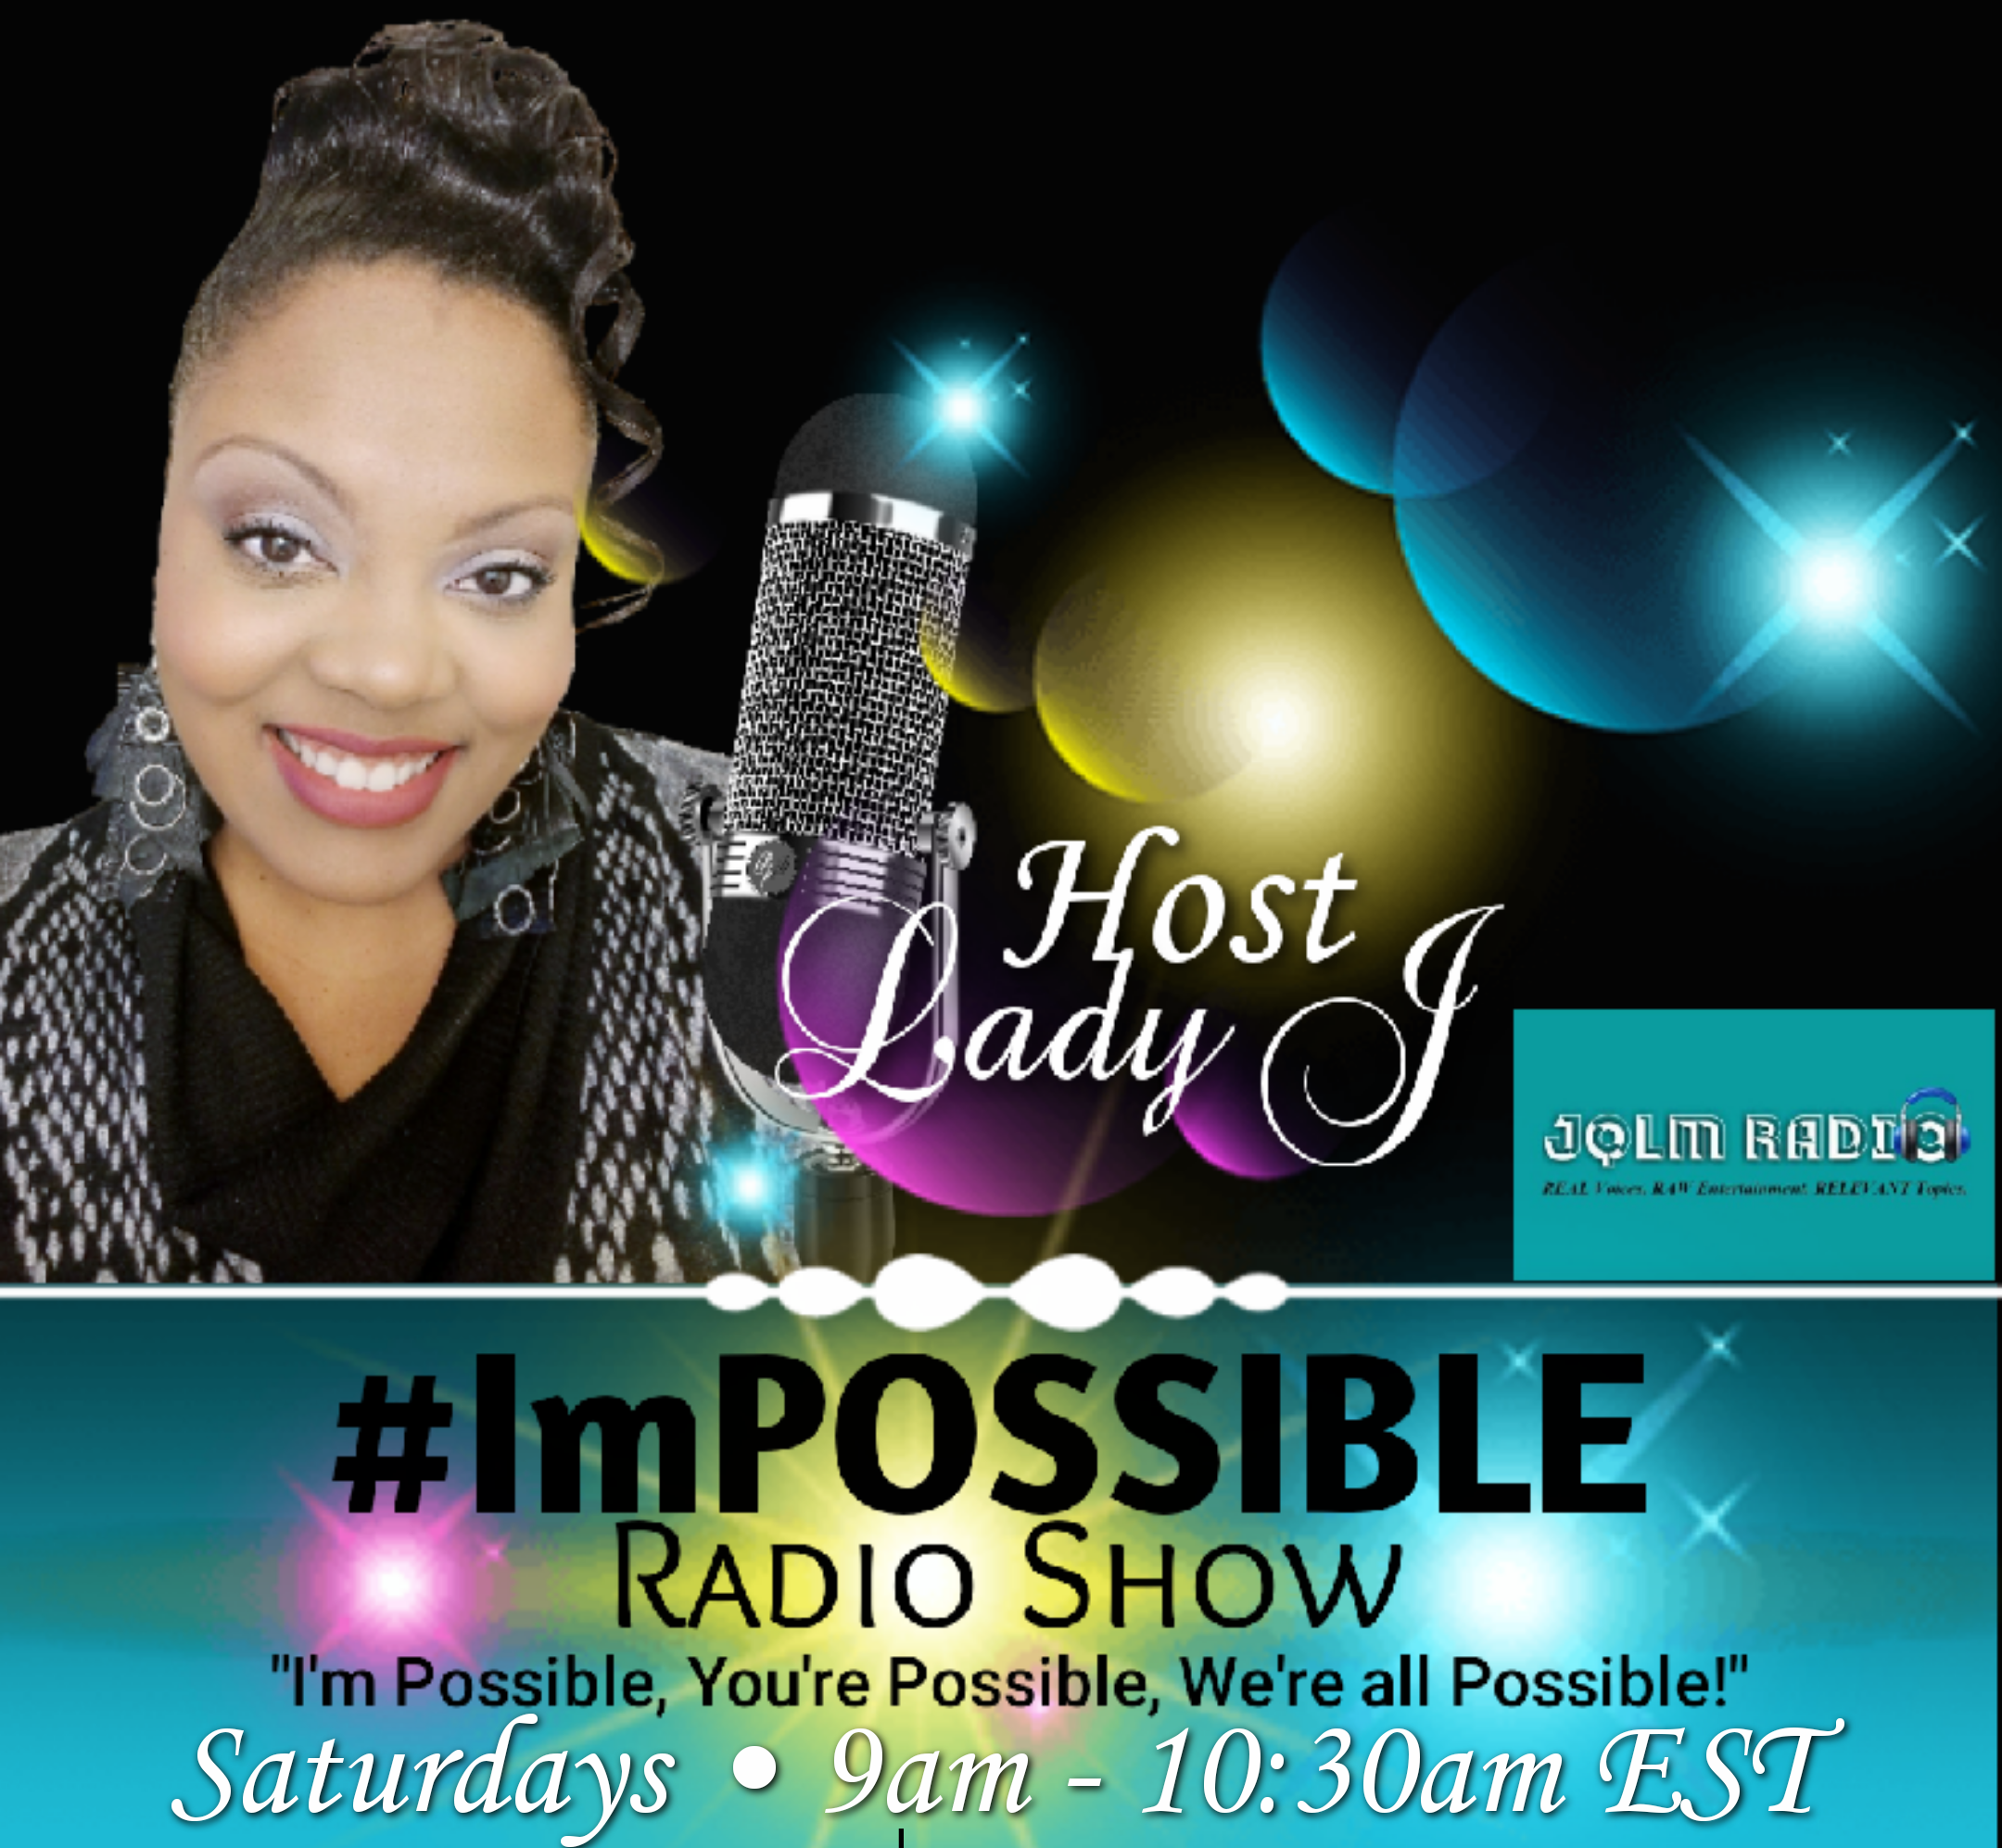 #ImPOSSIBLE RADIO SHOW